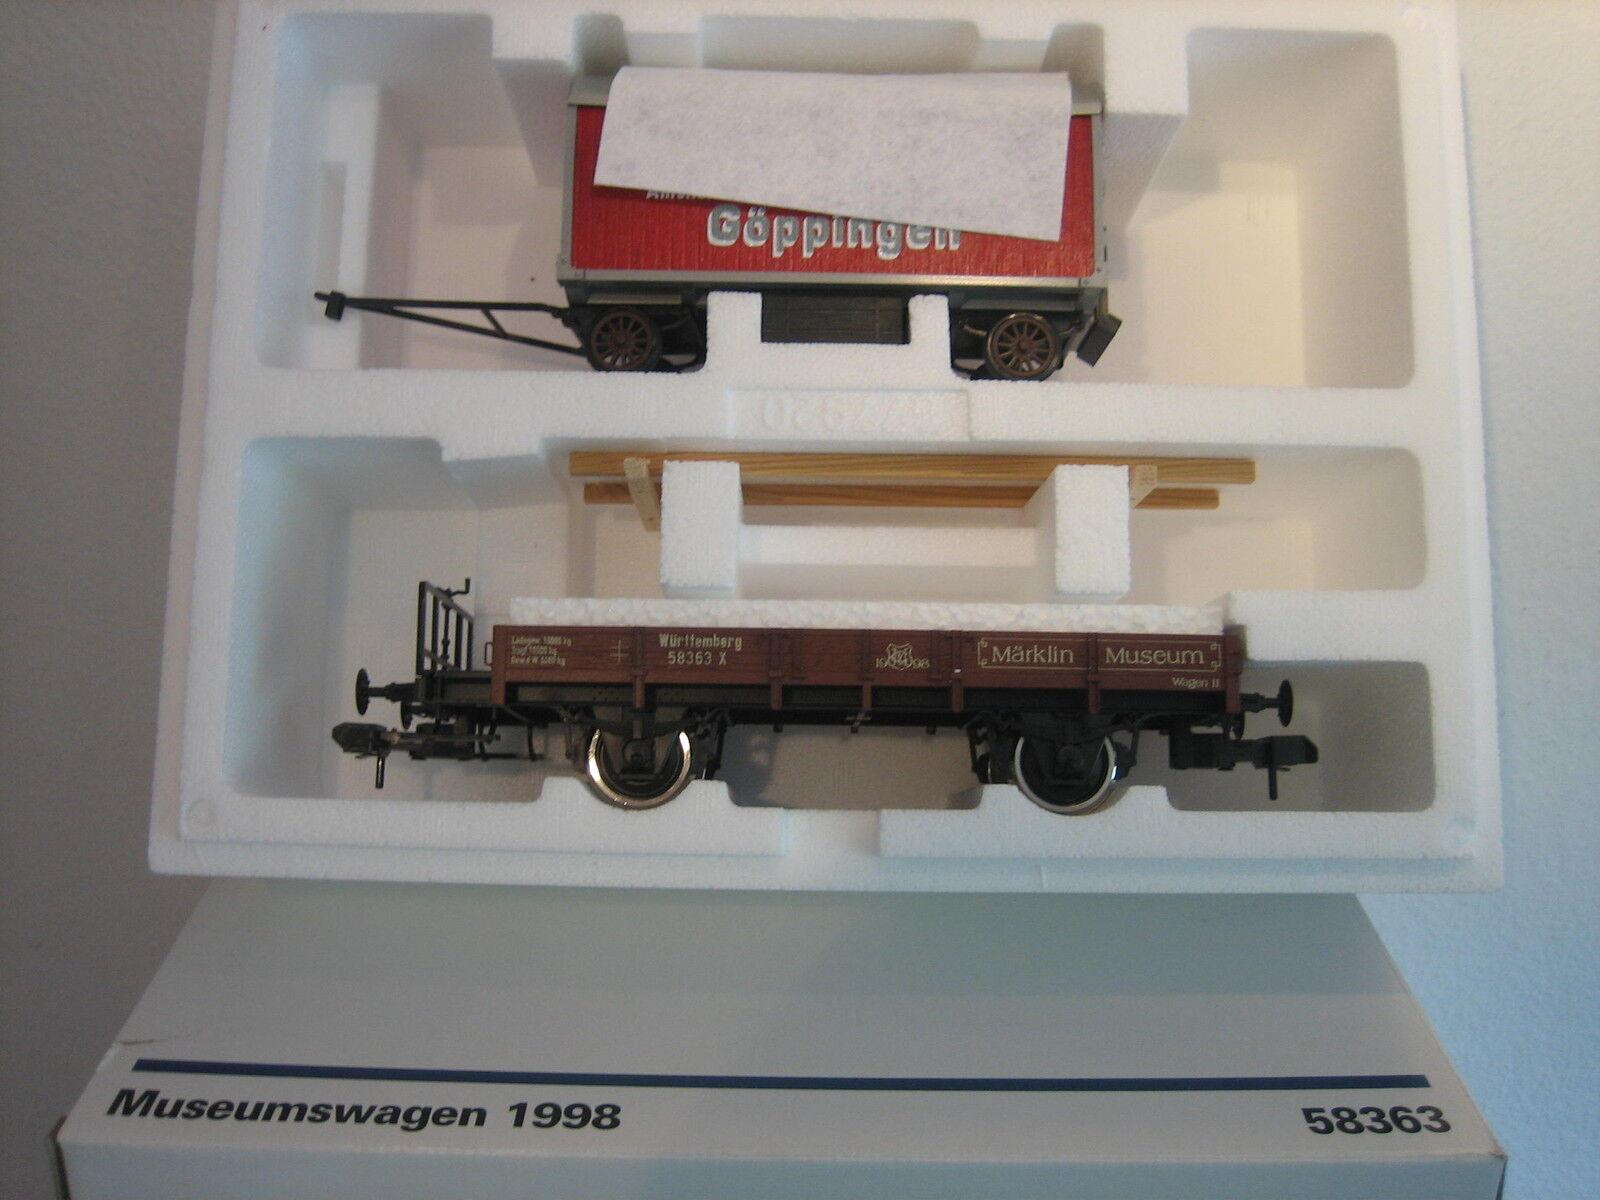 MÄRKLIN escala 1 58363 Vagón de Mercancías coche MUSEO 1998 Condición Nuevo